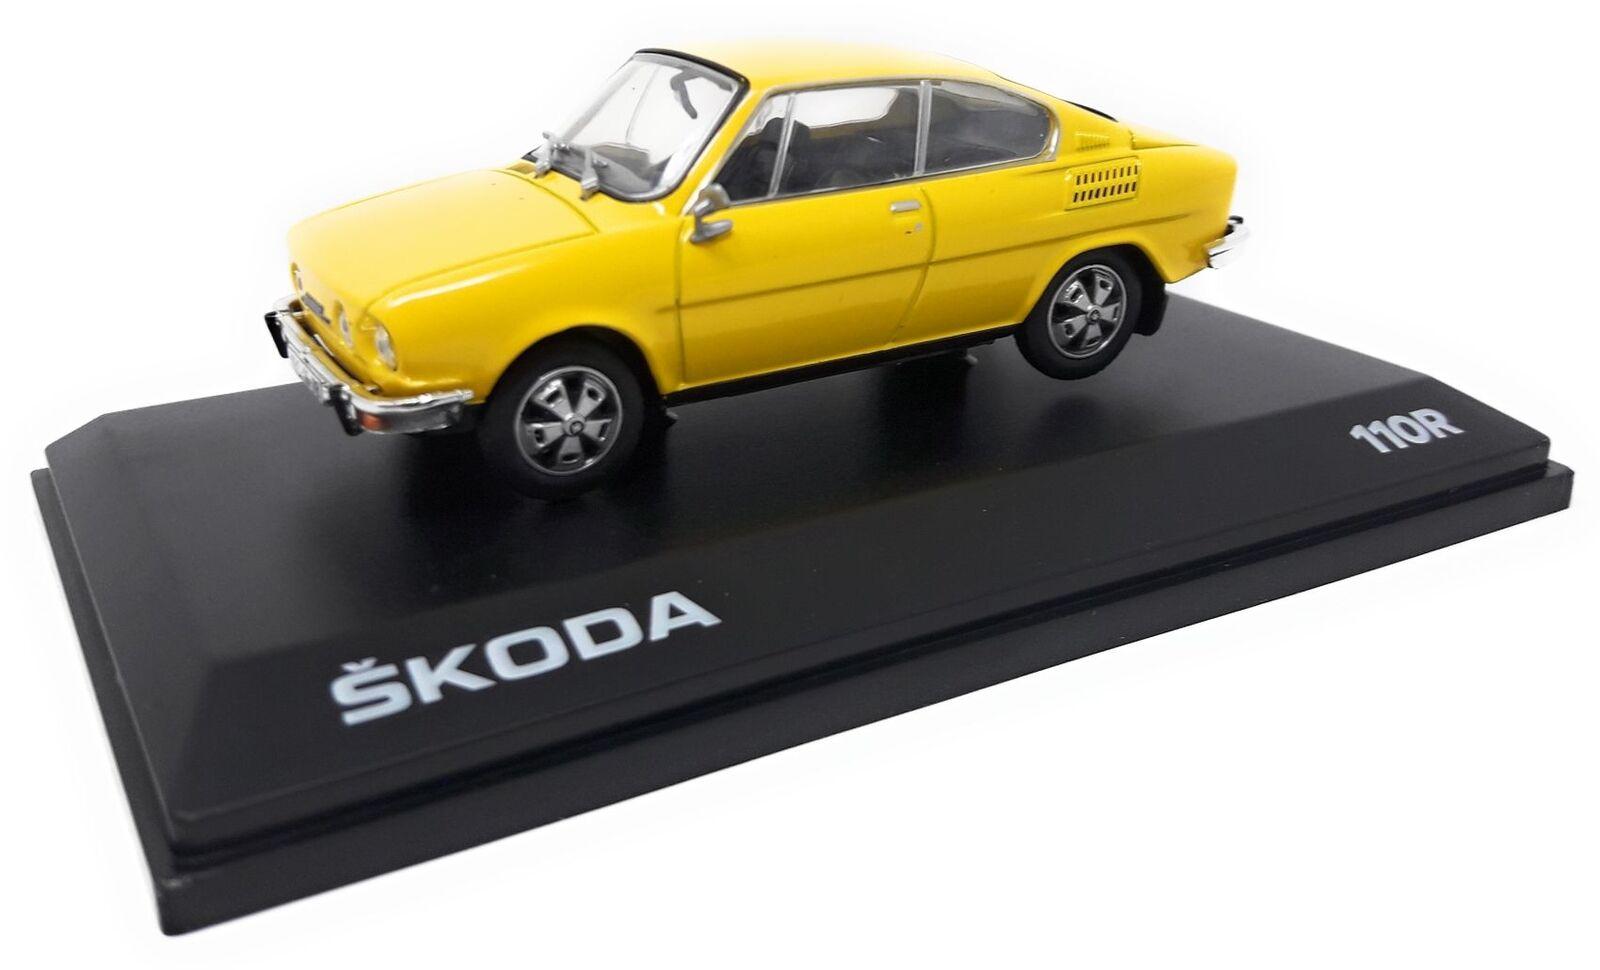 Abrex Metall Modellauto Modellauto Modellauto 1 43 Skoda 110 R Coupe yellow 1980 Kunststoff Vitrine 8f4490